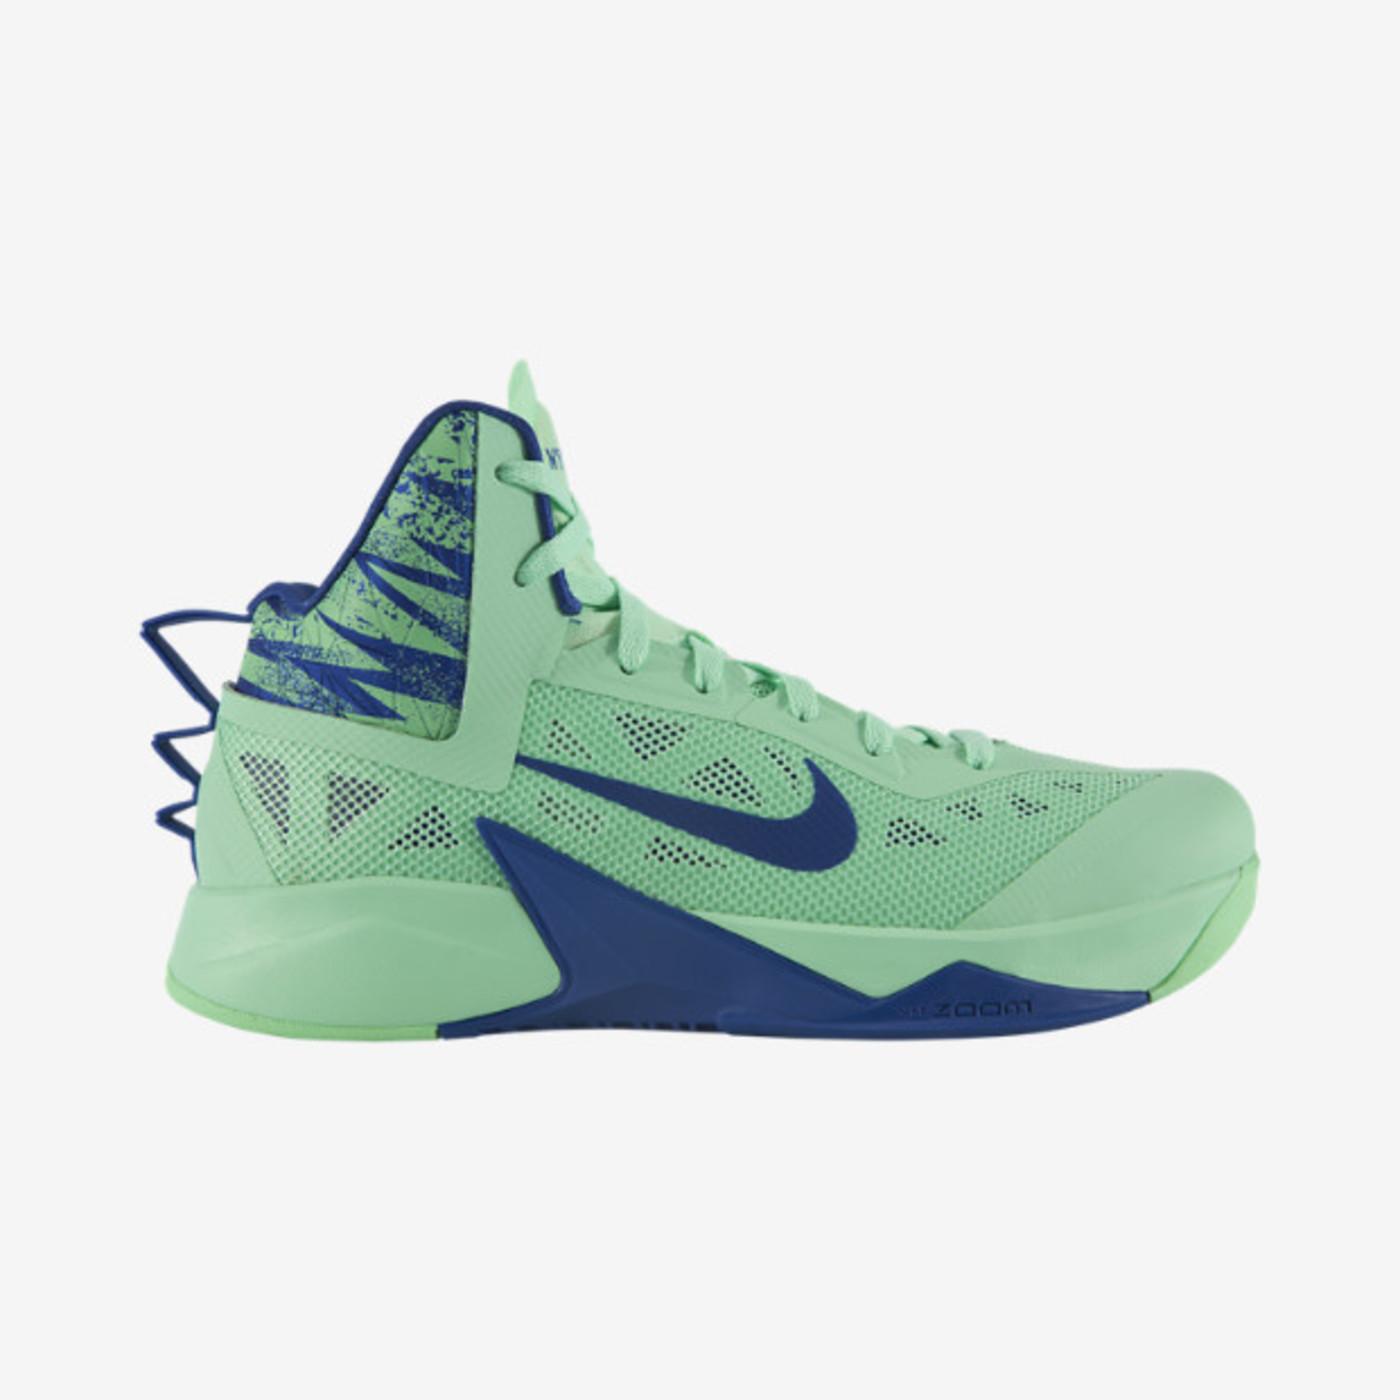 Aproximación Inmundicia Albany  Nike Zoom Hyperfuse 2013